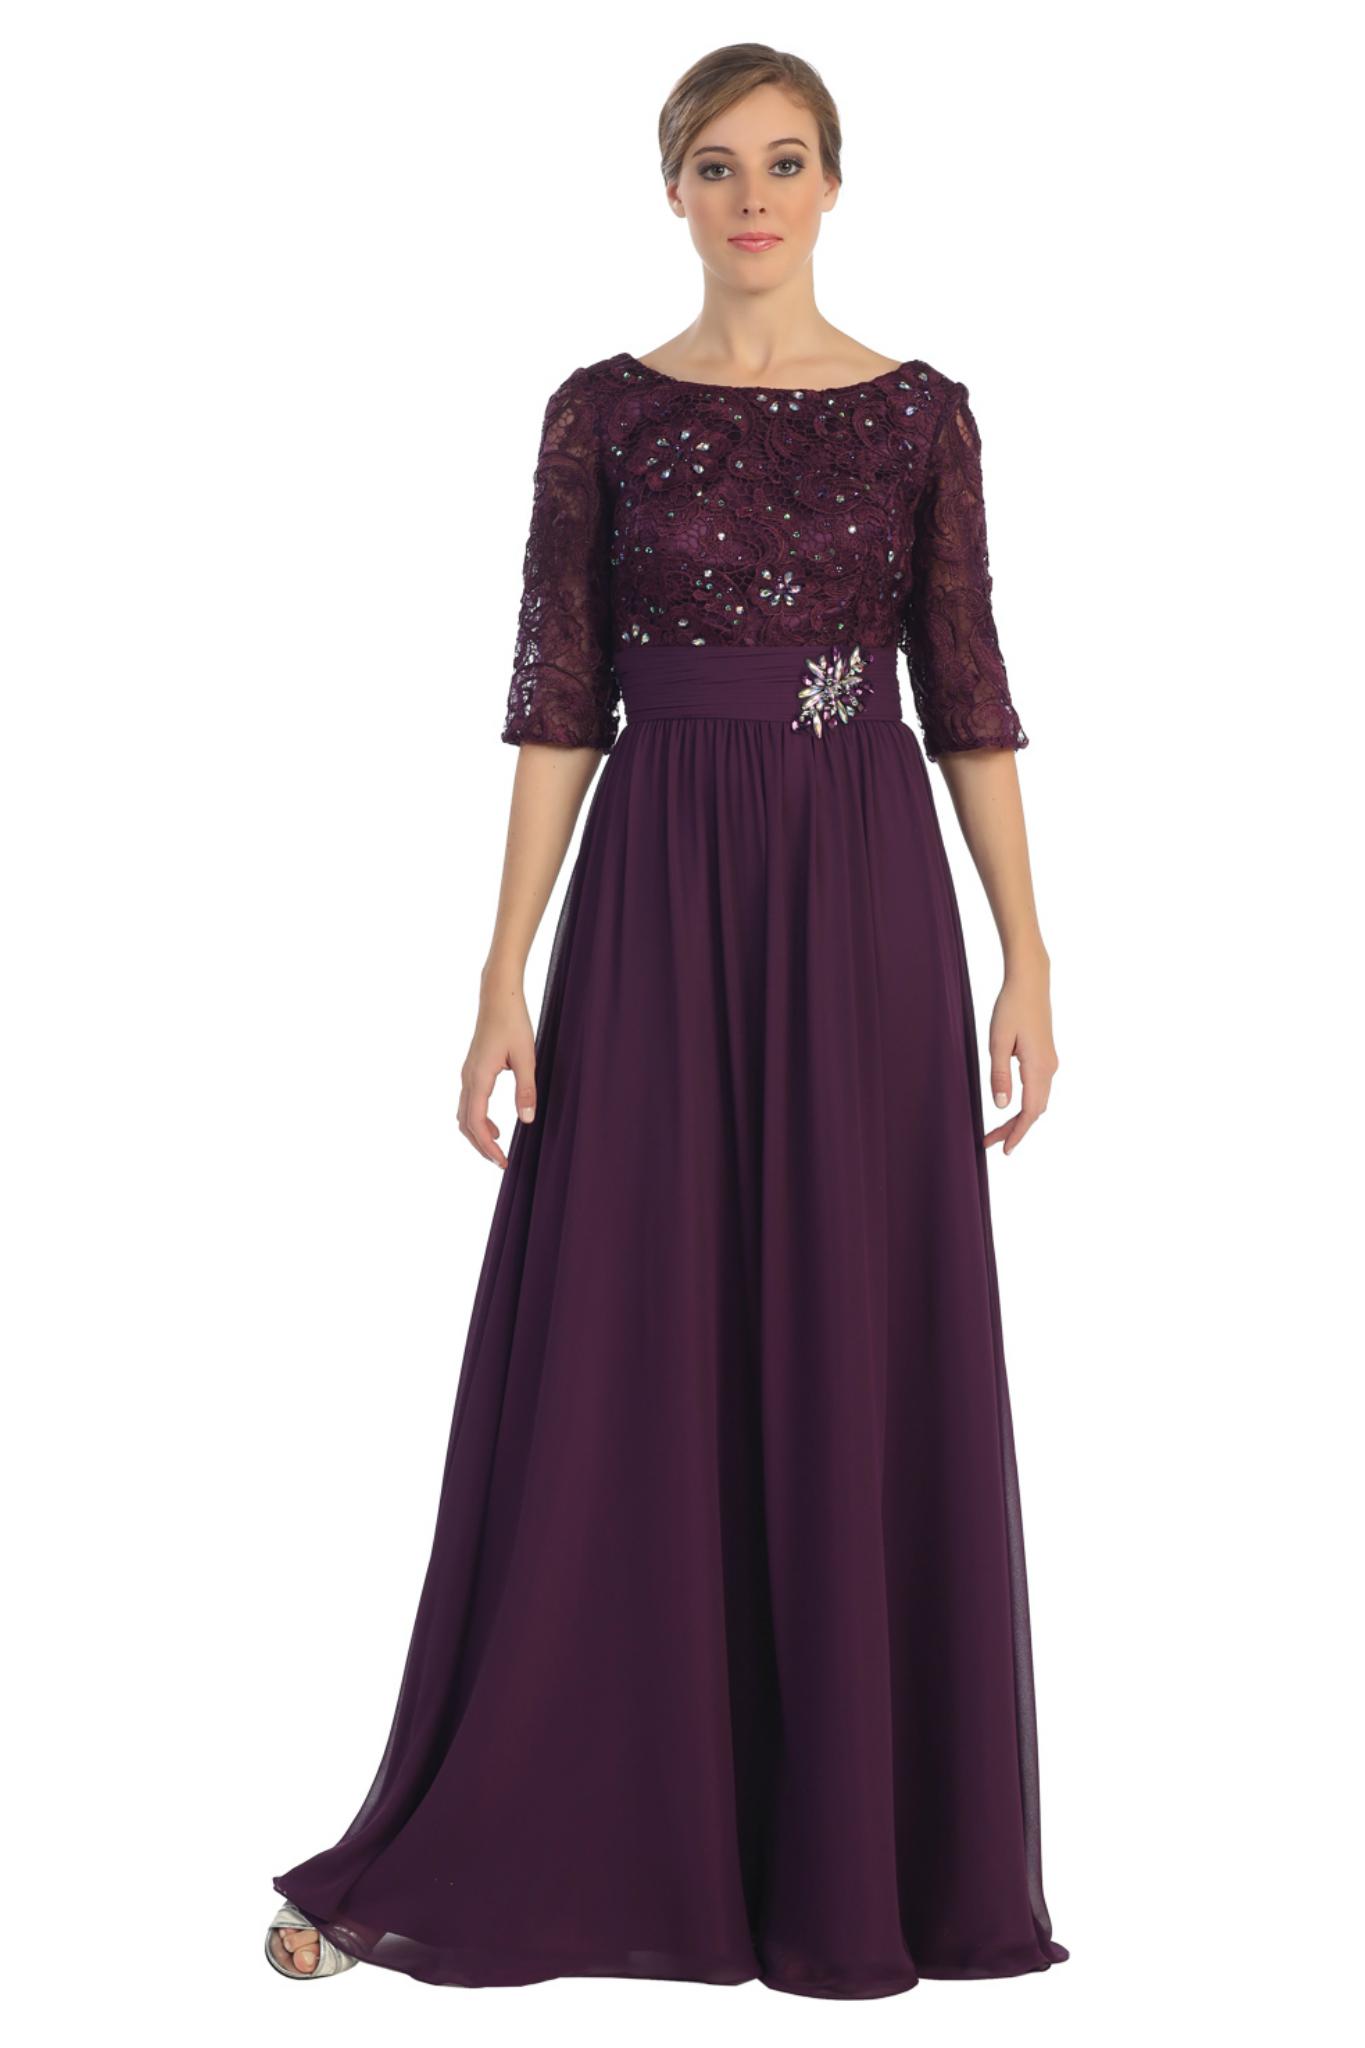 Plum Mother Of The Bride Dresses - Cheap Wedding Dresses